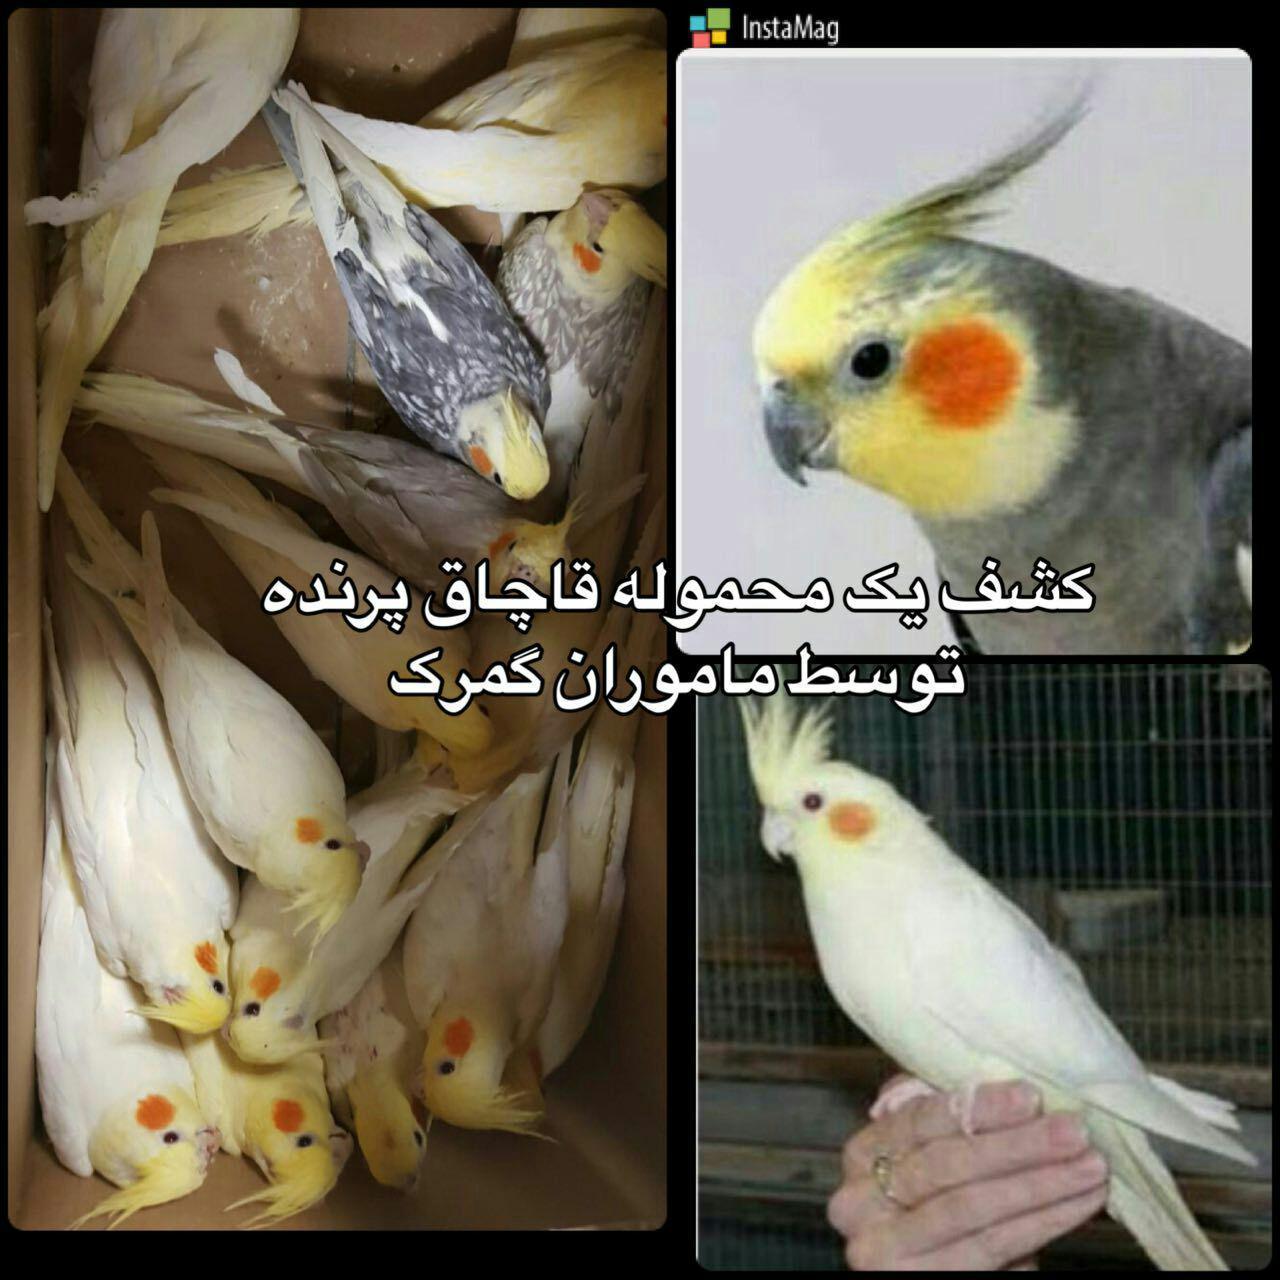 کشف محموله قاچاق پرنده در گمرک+عکس